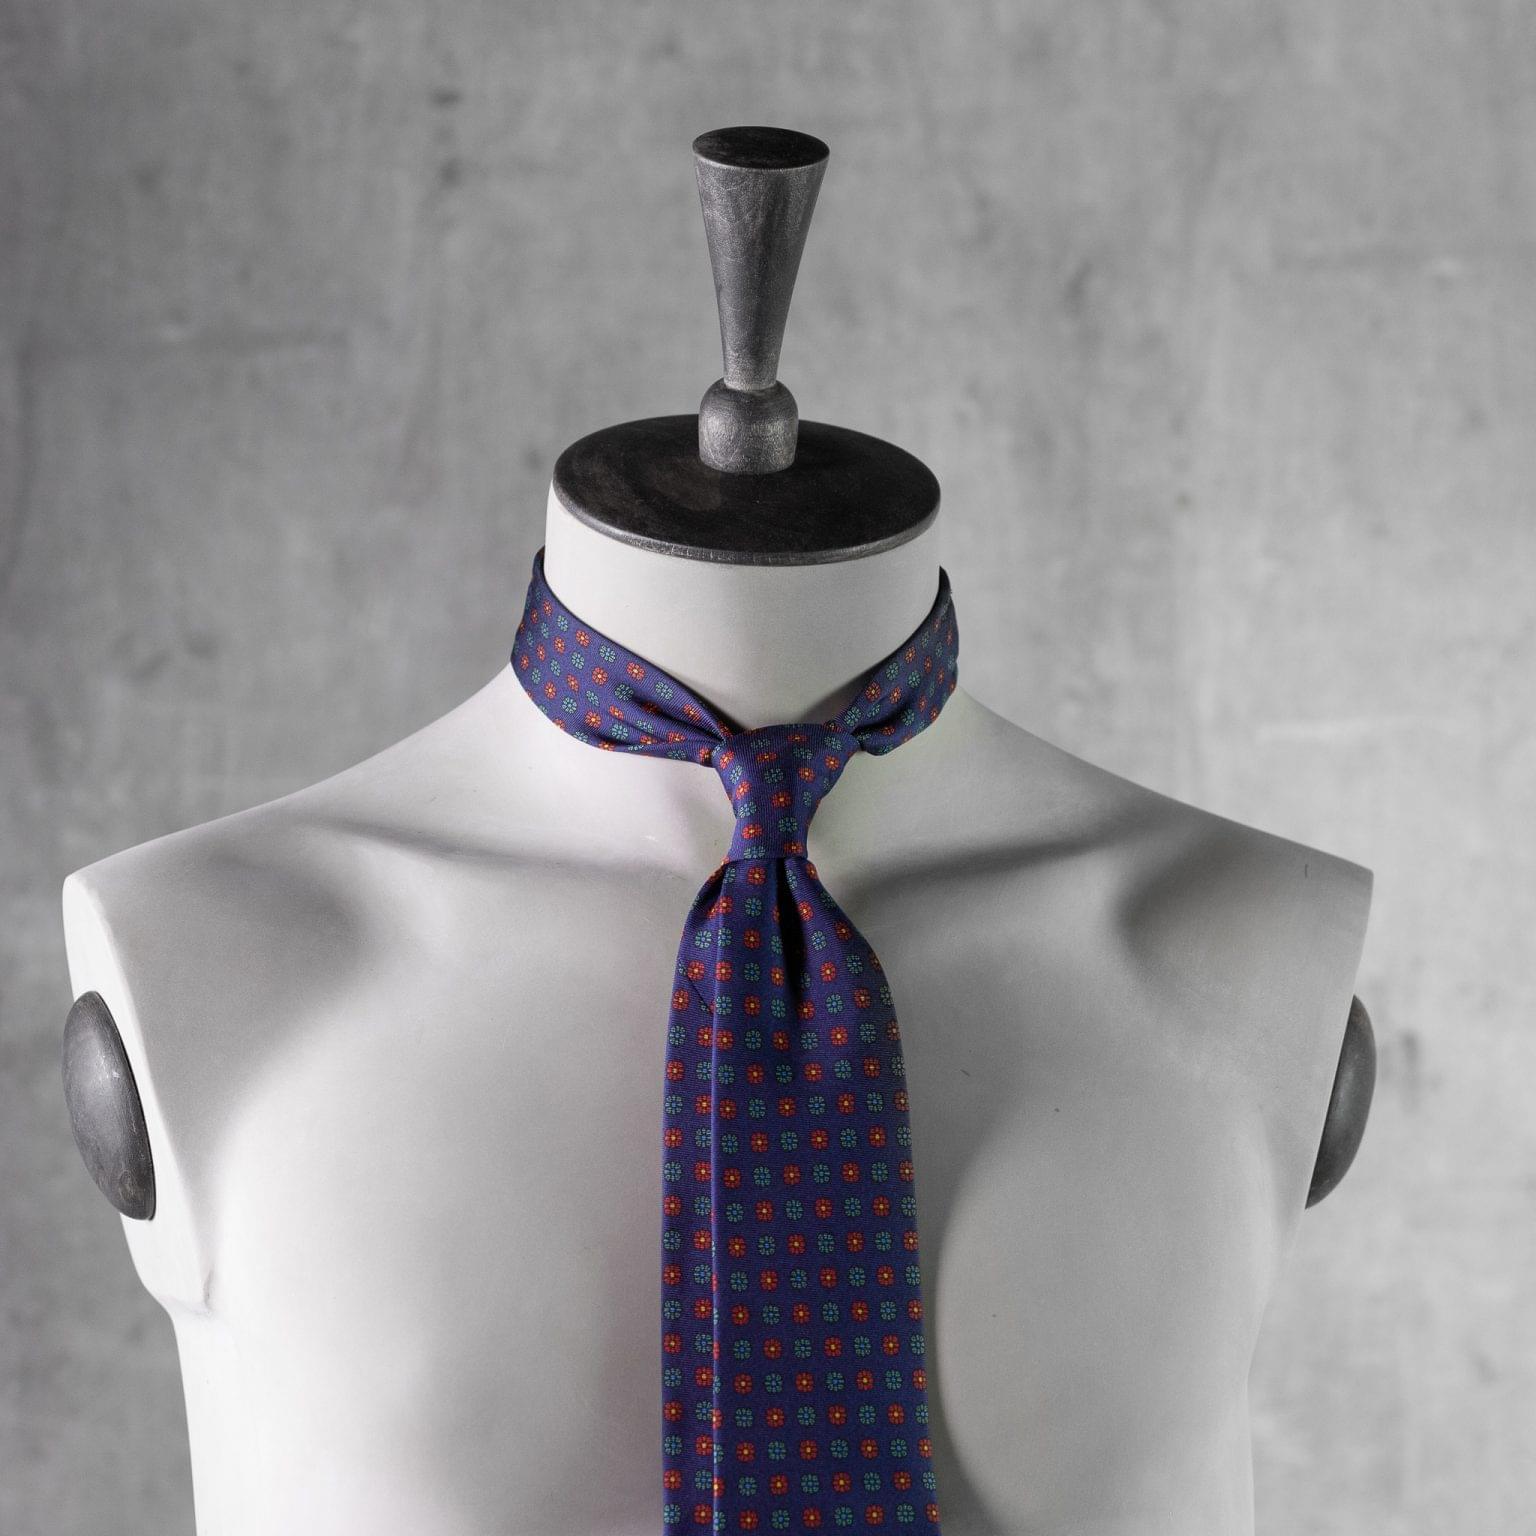 PRINTED-SILK-SEDA-ESTAMPADA-0504-Tie-Initials-Corbata-Iniciales-The-Seelk-3